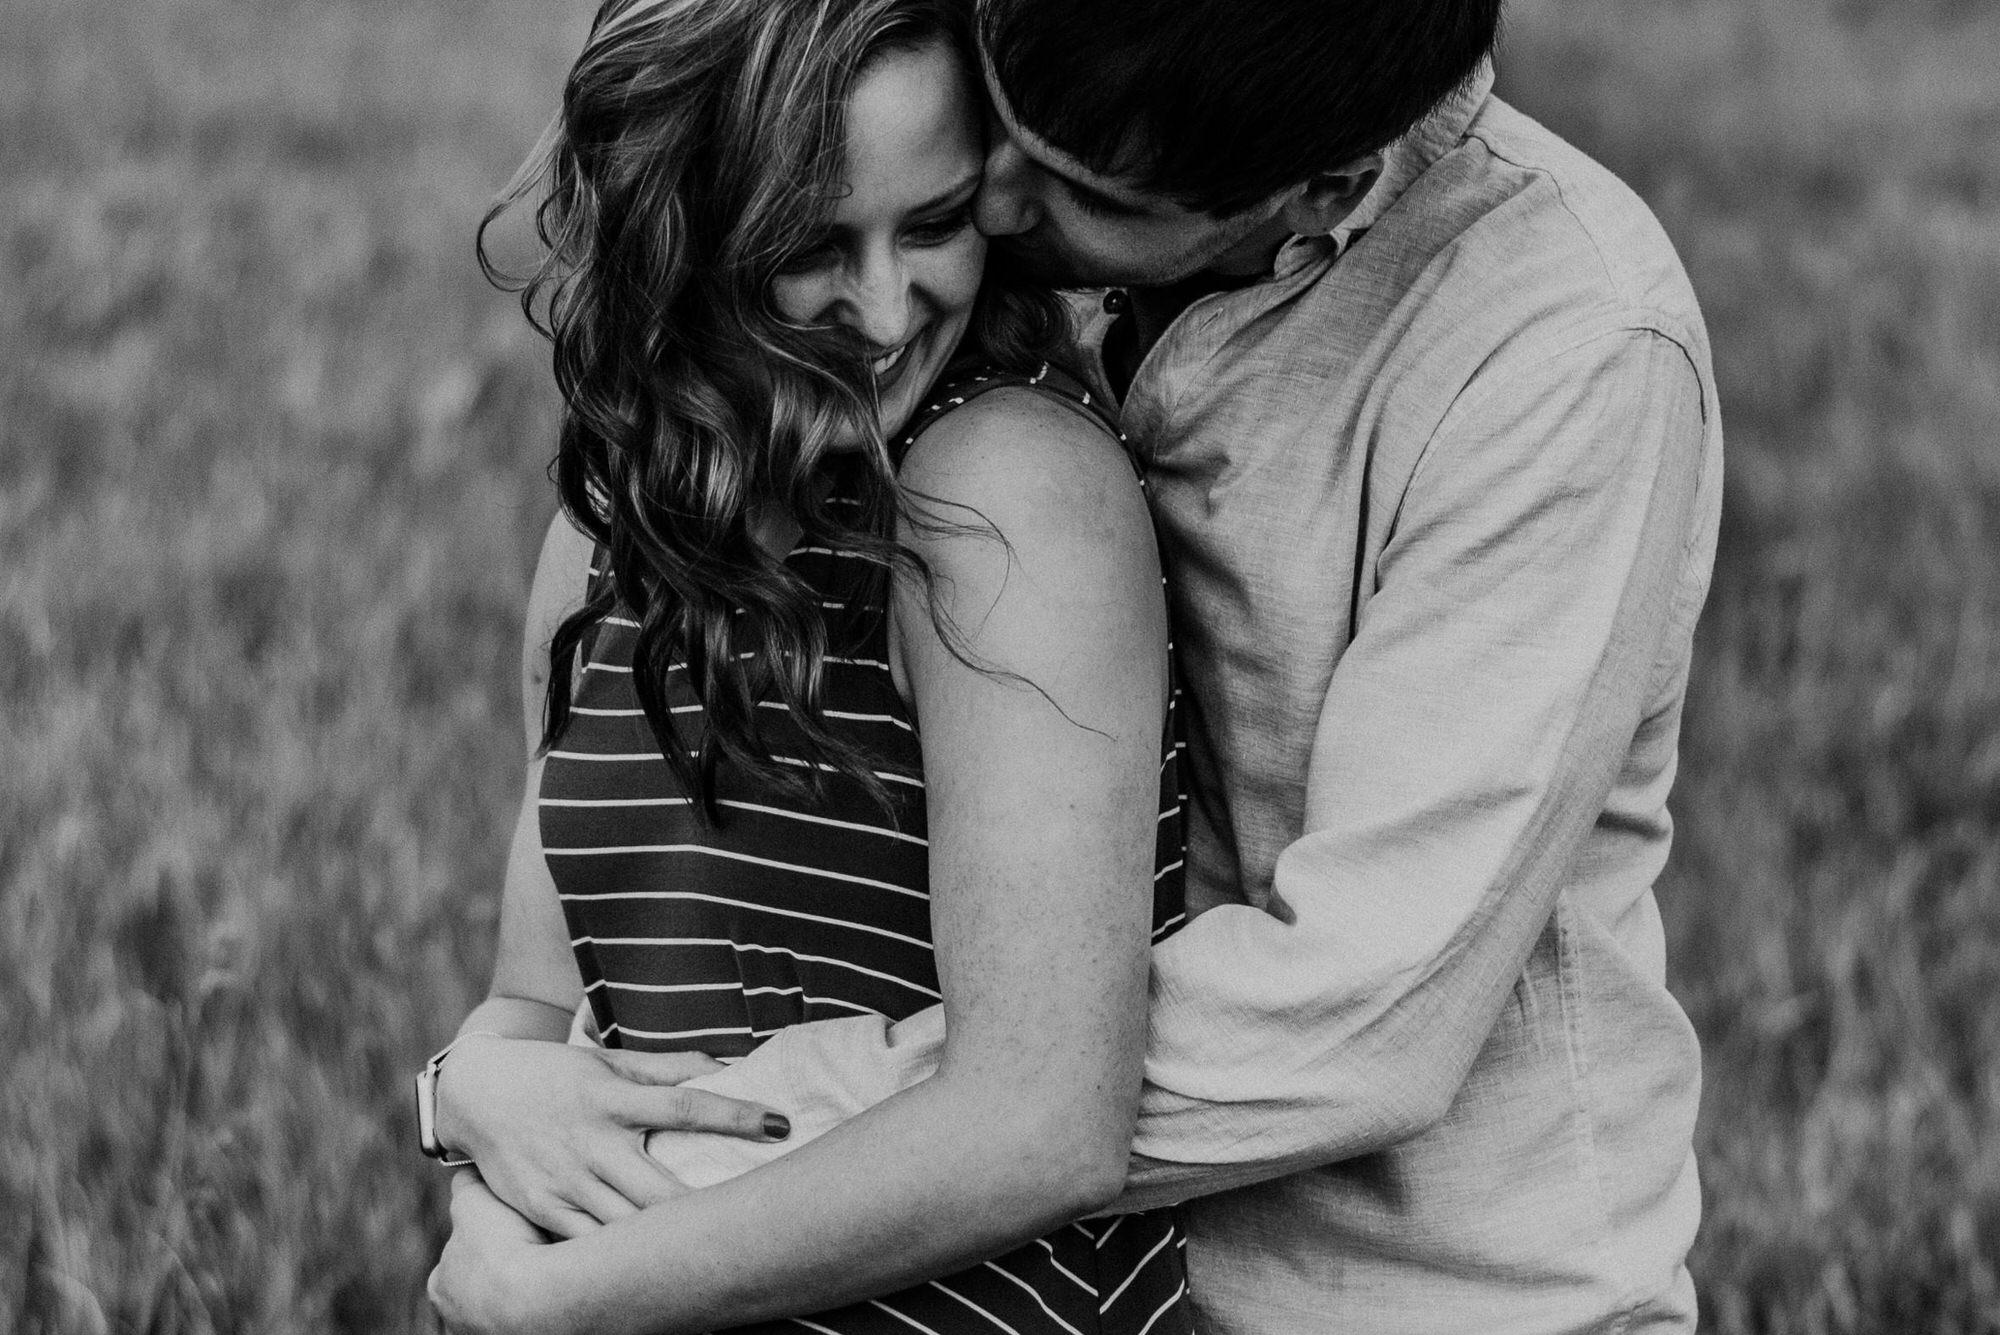 Kaylie-Sirek-Photography-wedding-engagement-photographer-Grand-Island-Kearney-Hastings-Lincoln-Nebraska-central-midwest-moments-trump-posing-natural-light-engaged-01.jpg